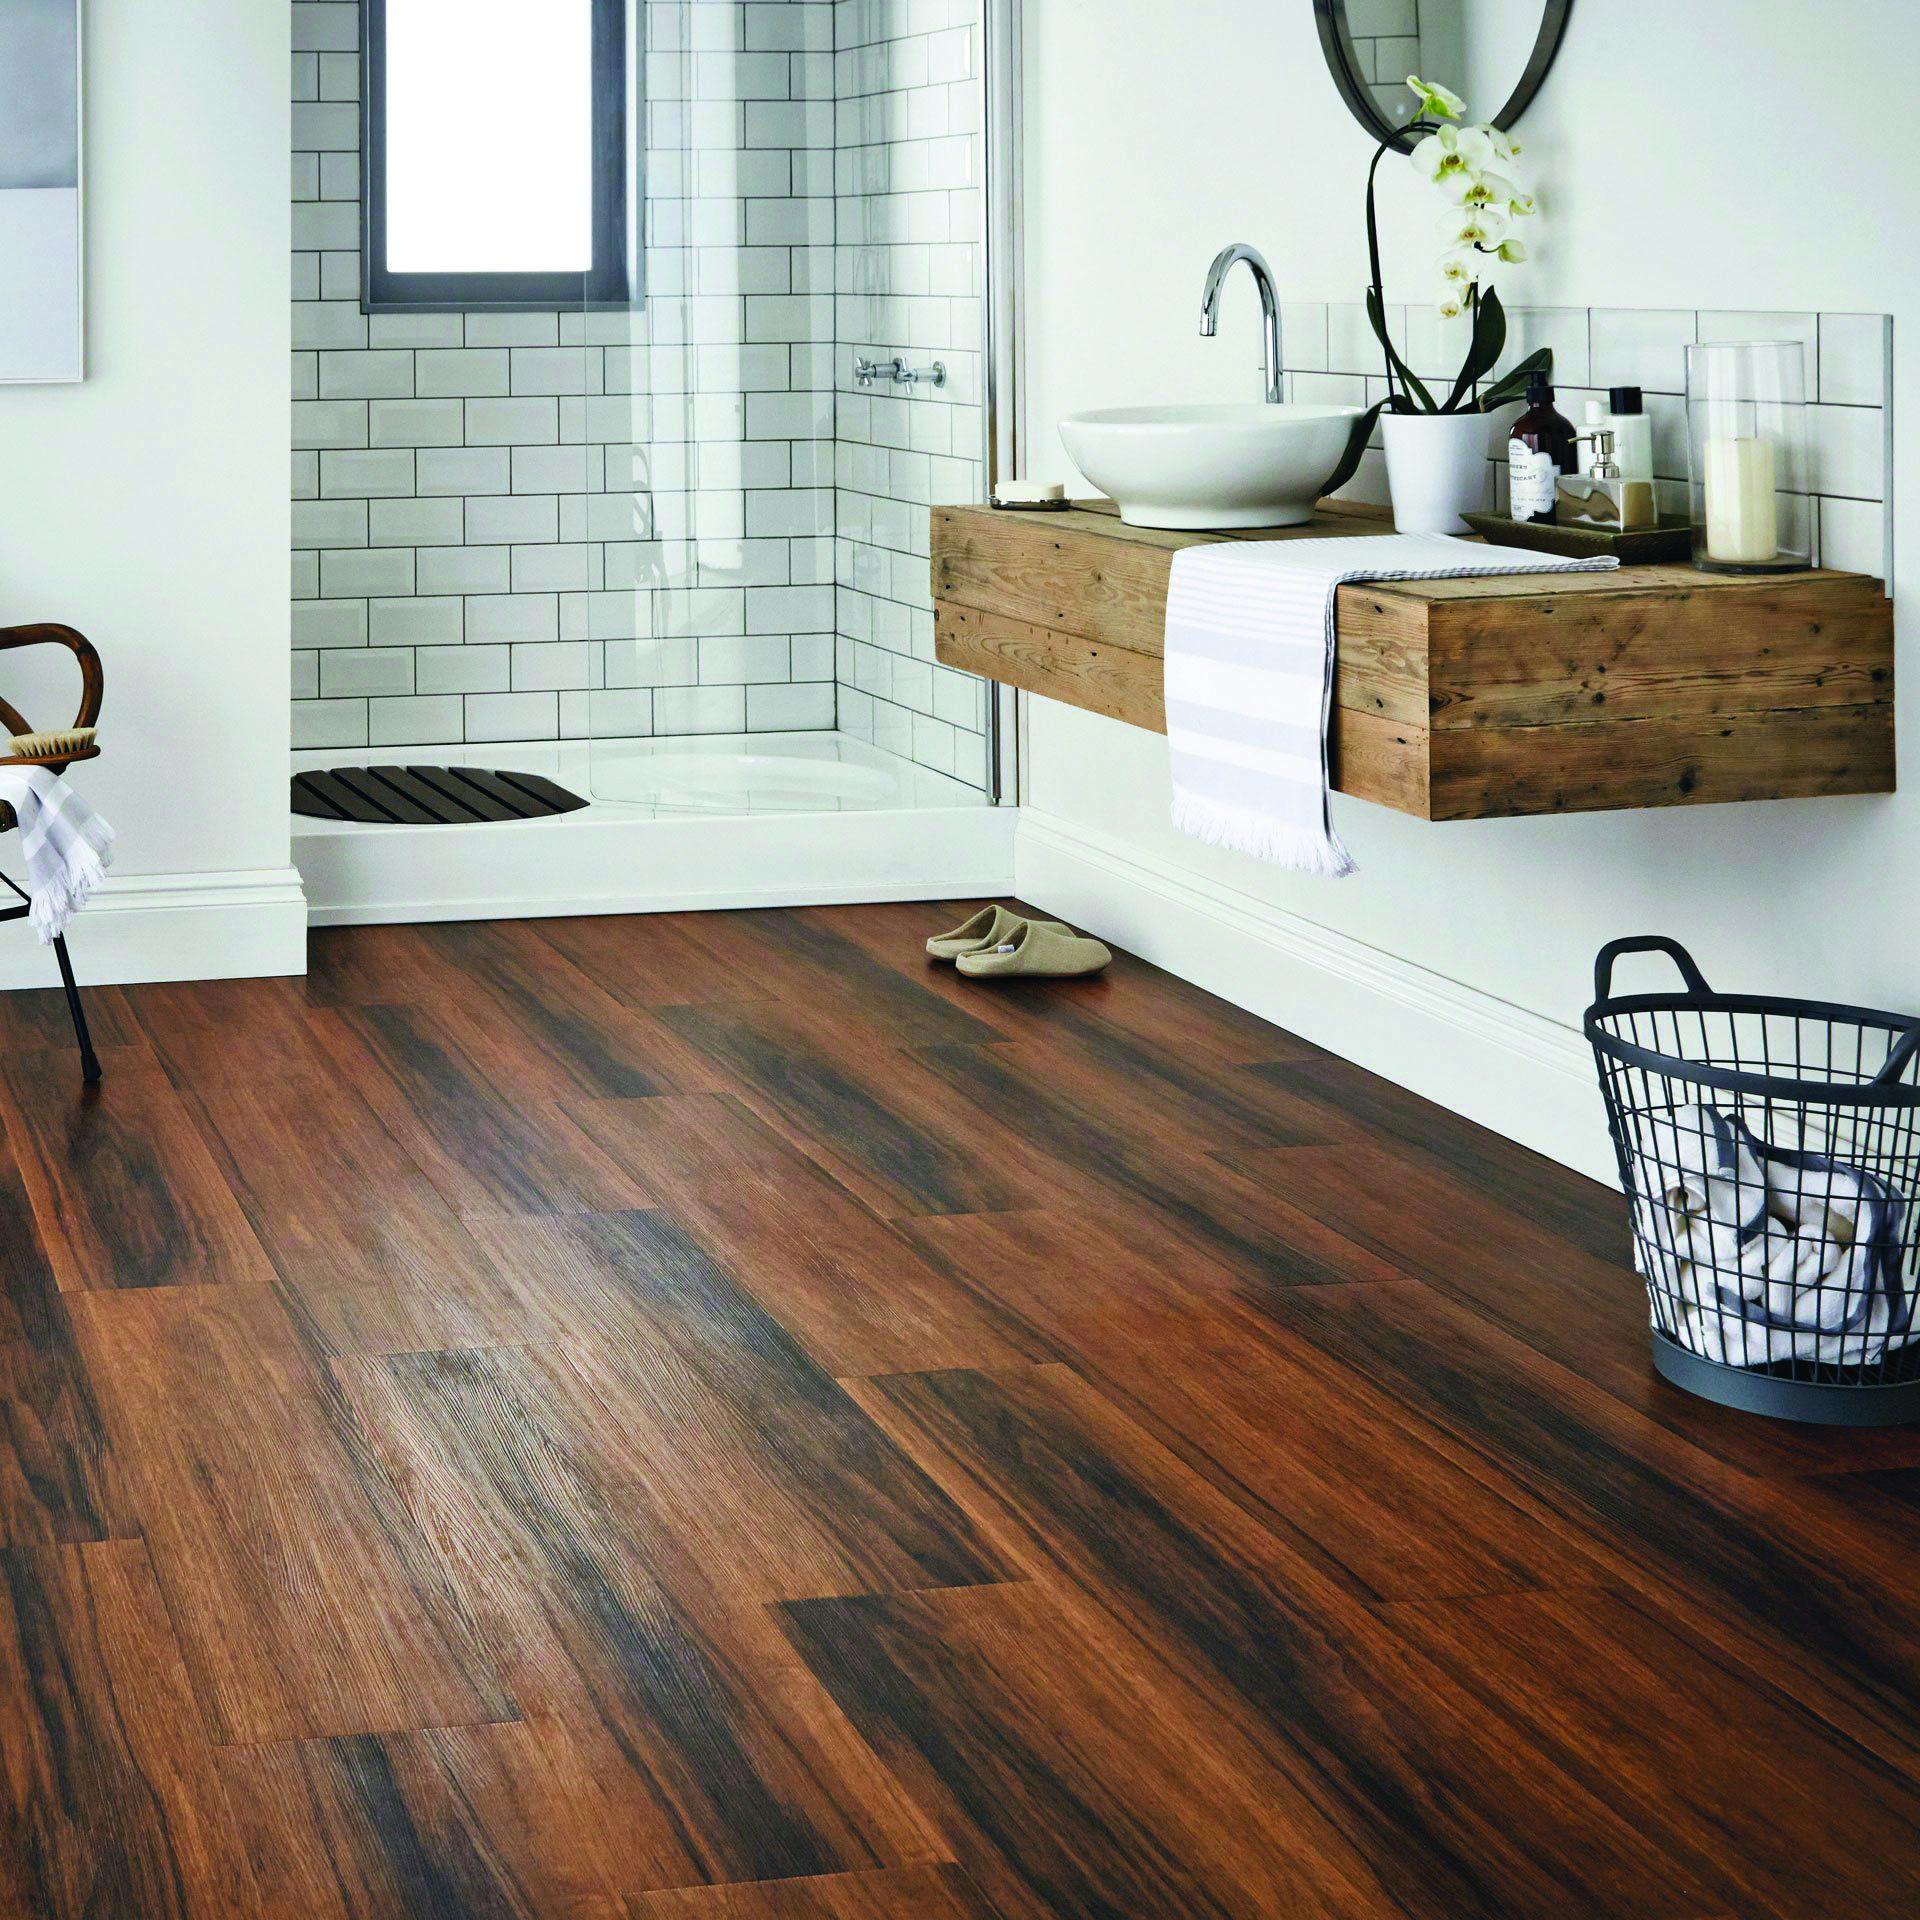 Homeeideas Com Vinyl Flooring Bathroom Trendy Bathroom Tiles Flooring